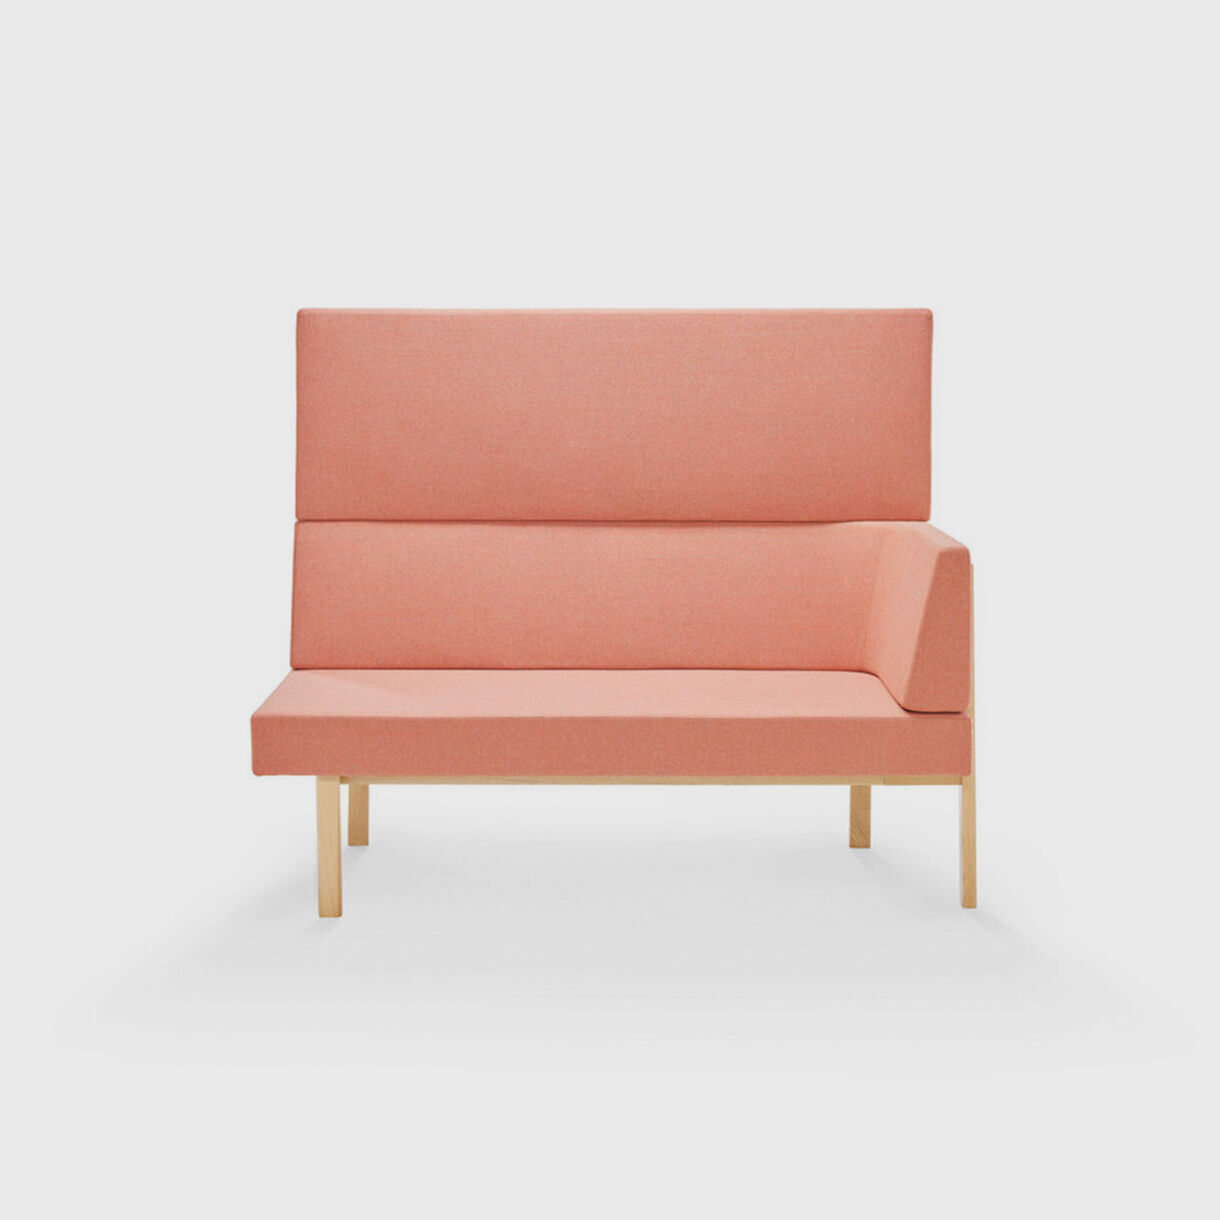 Homework Highback Chaise Lounge, Peach